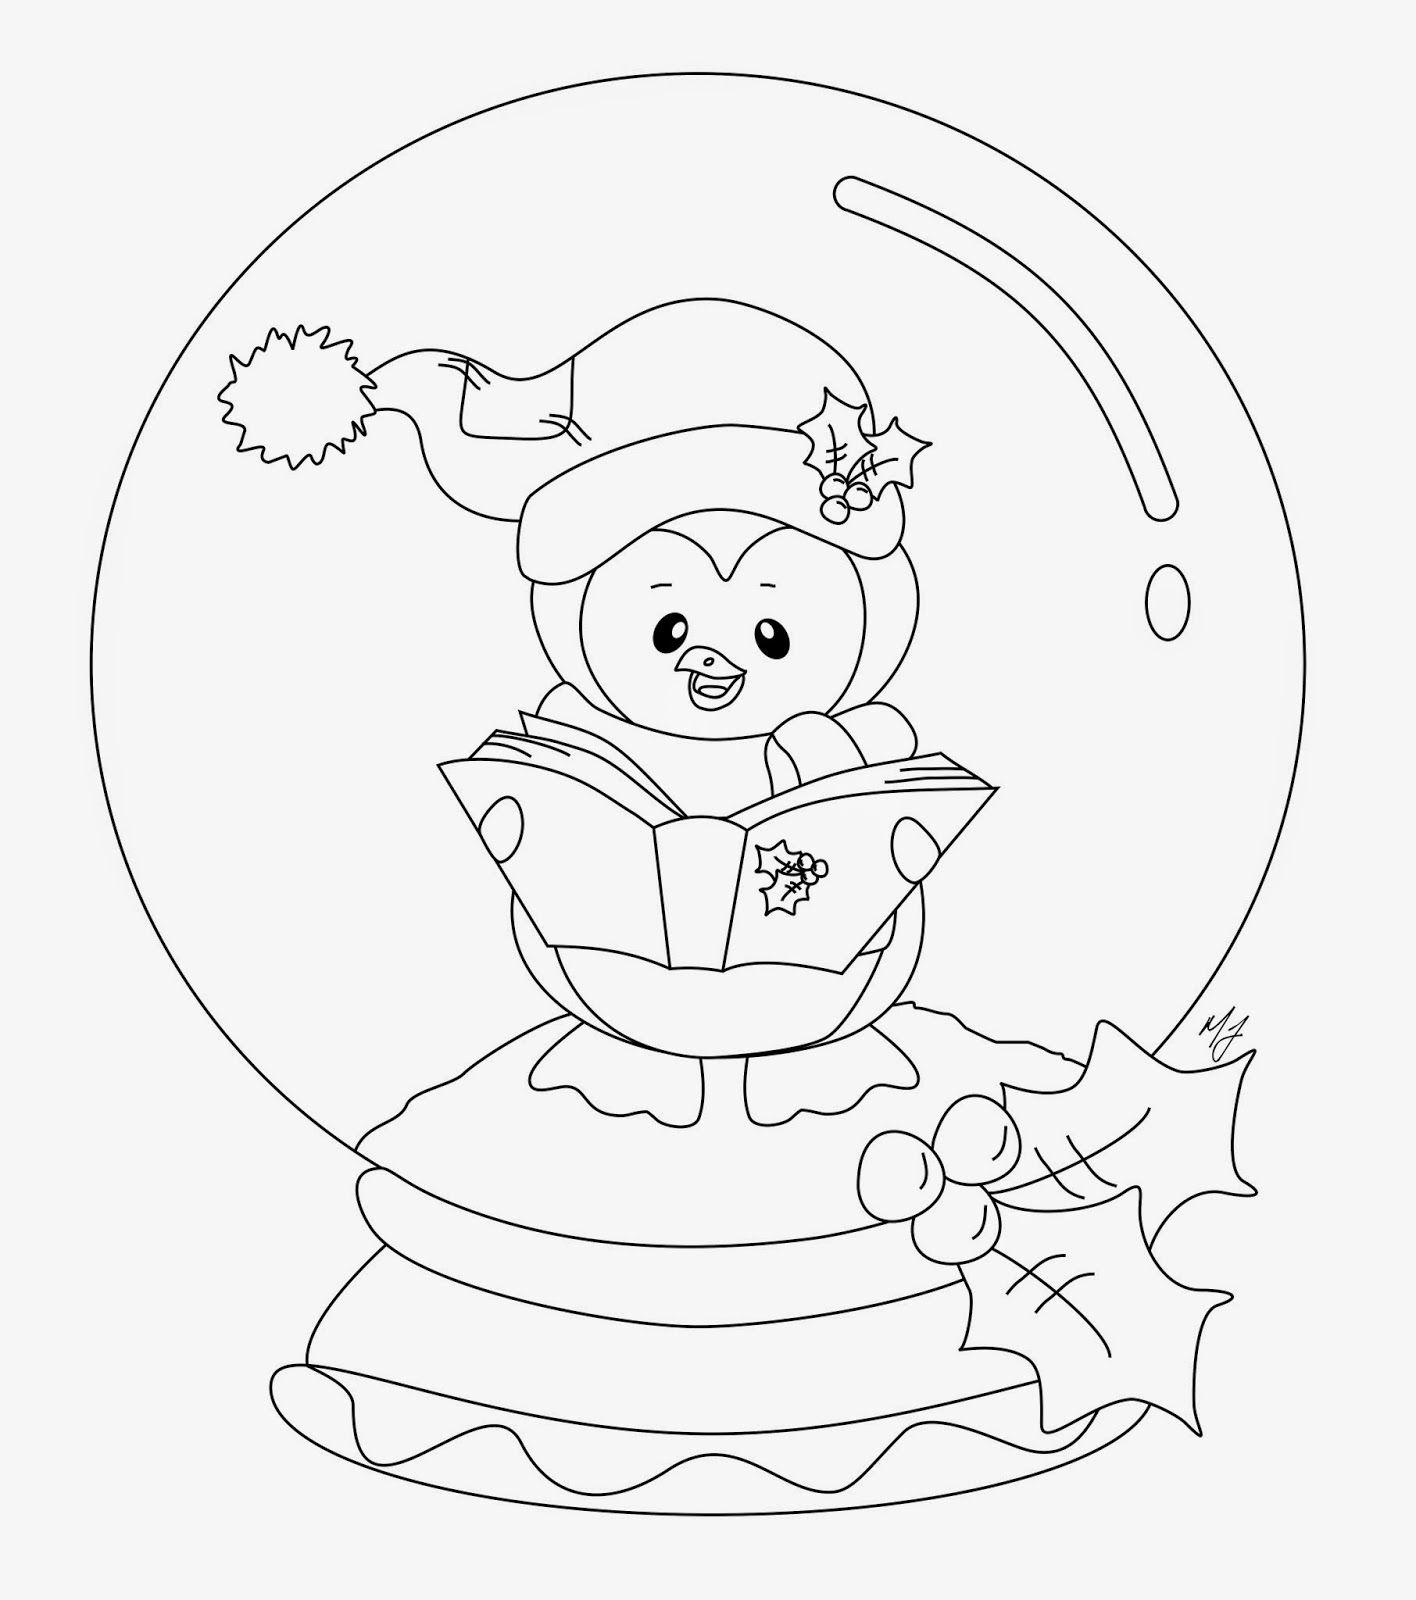 snowglobe+penguin+2+bw.jpg (JPEG Image, 1416 × 1600 pixels